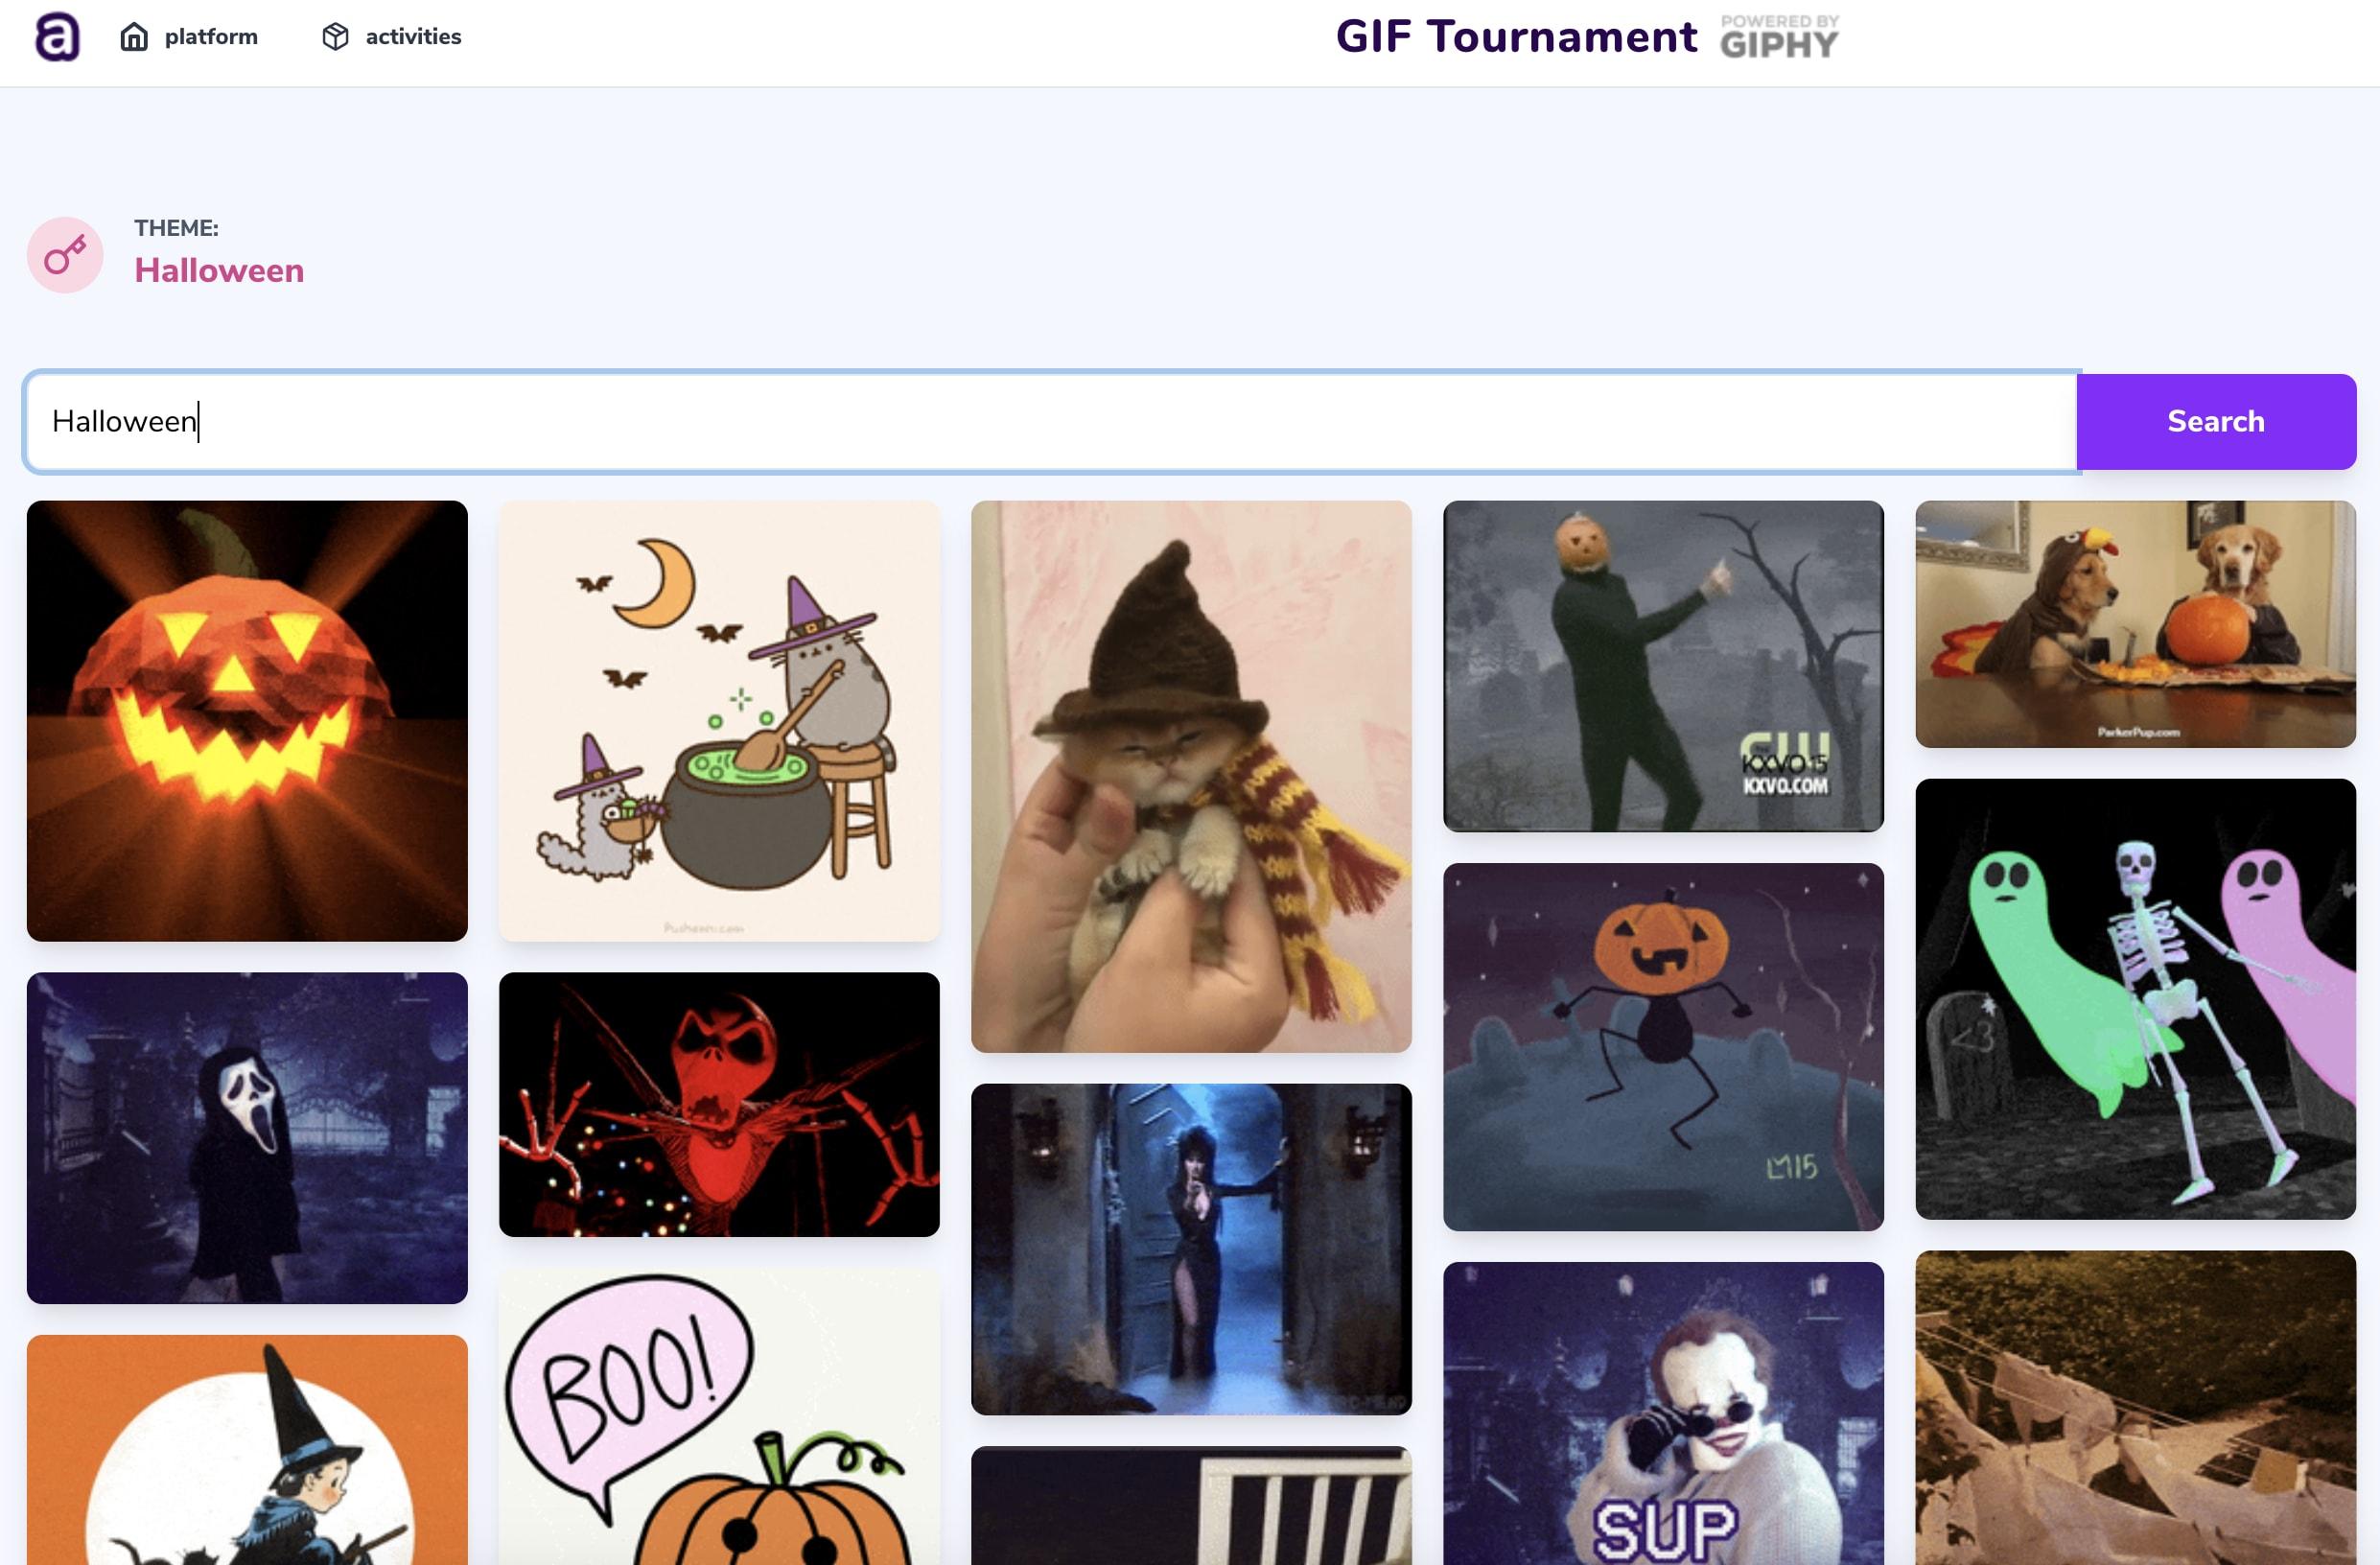 Play Atium's activities - Halloween style